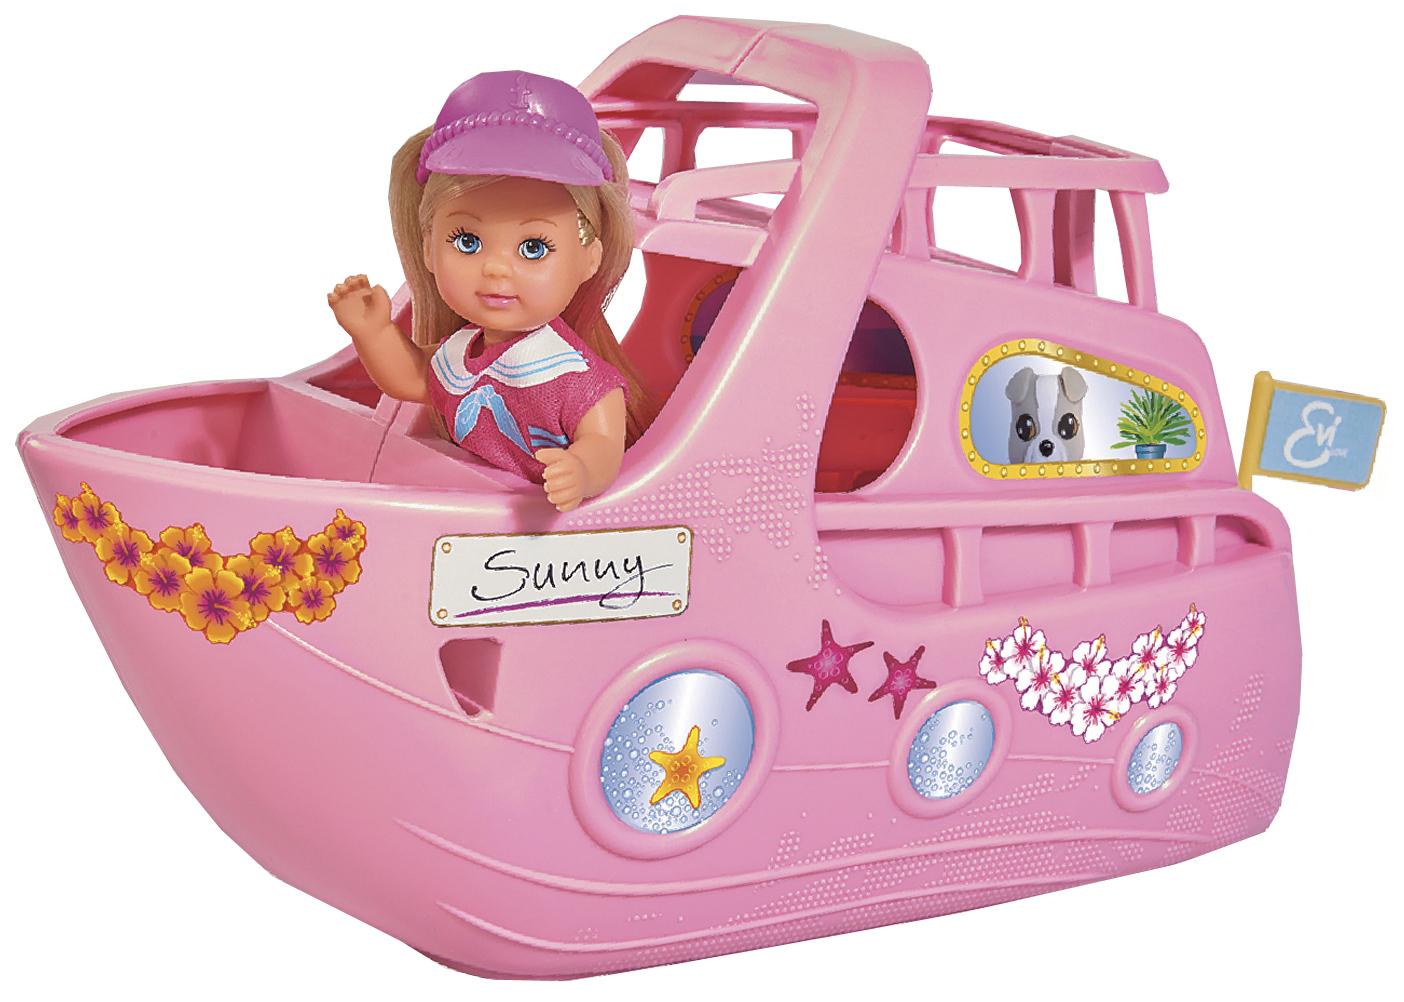 Купить На круизном корабле, Кукла Simba Ева на круизном корабле 5733083 12 см, Классические куклы